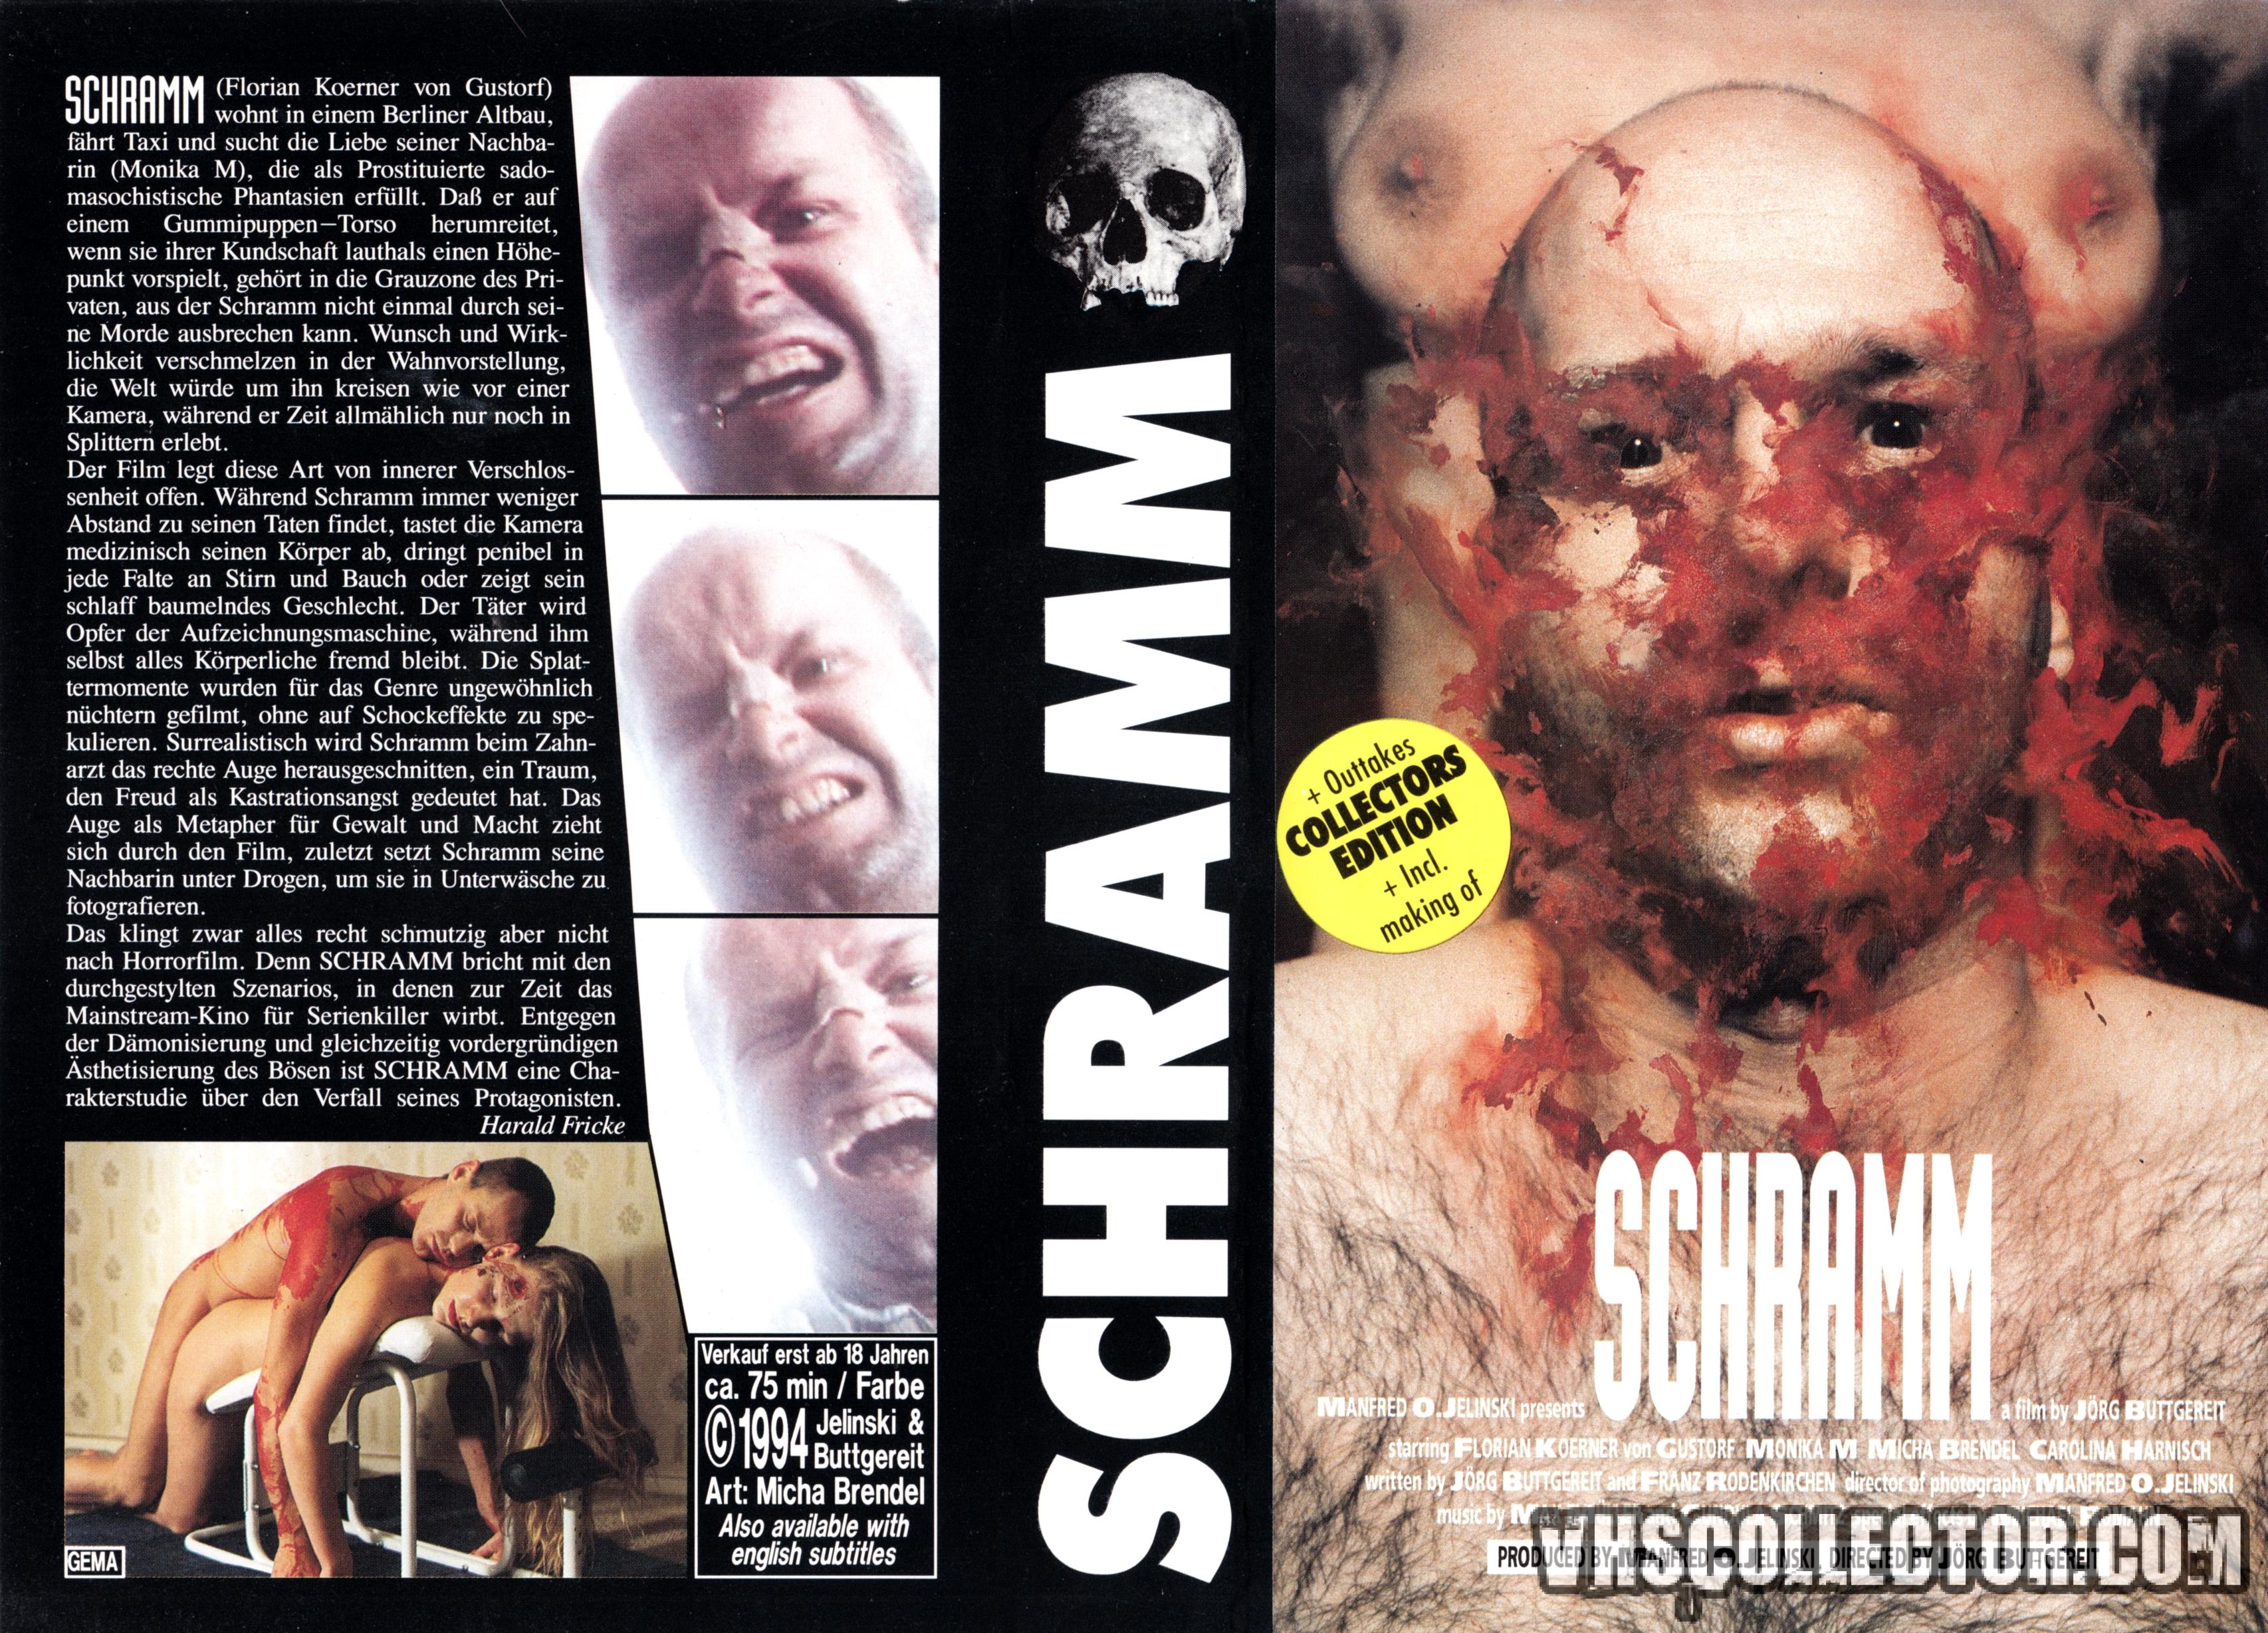 The Schramms